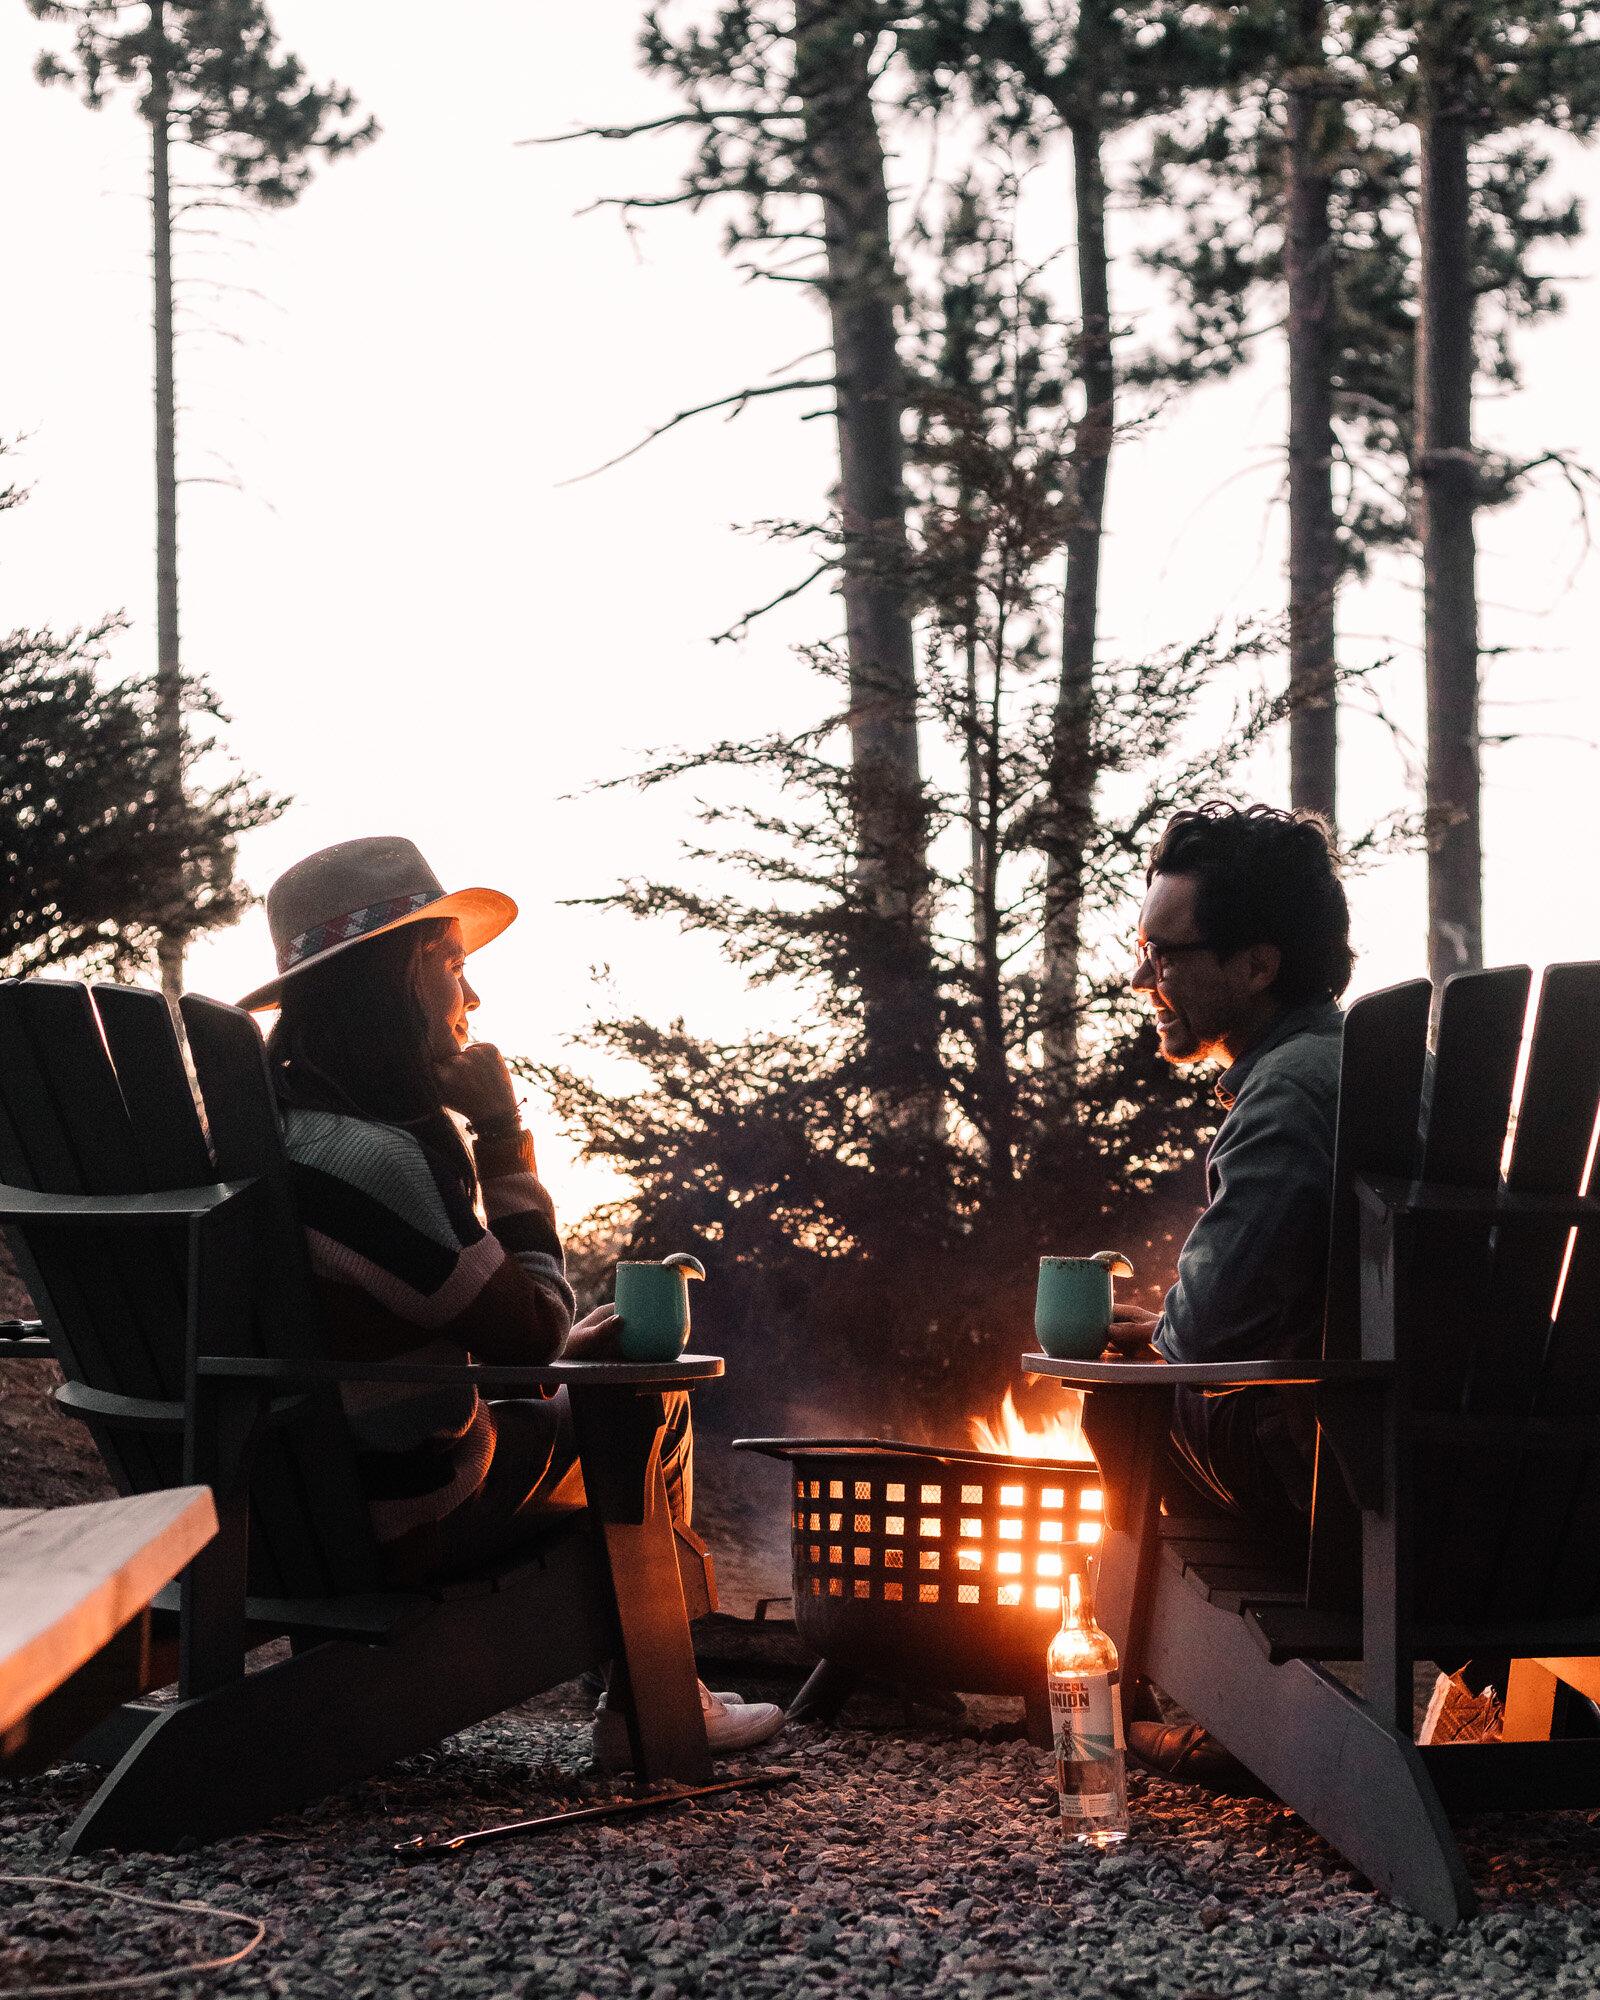 Rachel Off Duty: Couple Enjoying a Campfire at Dusk